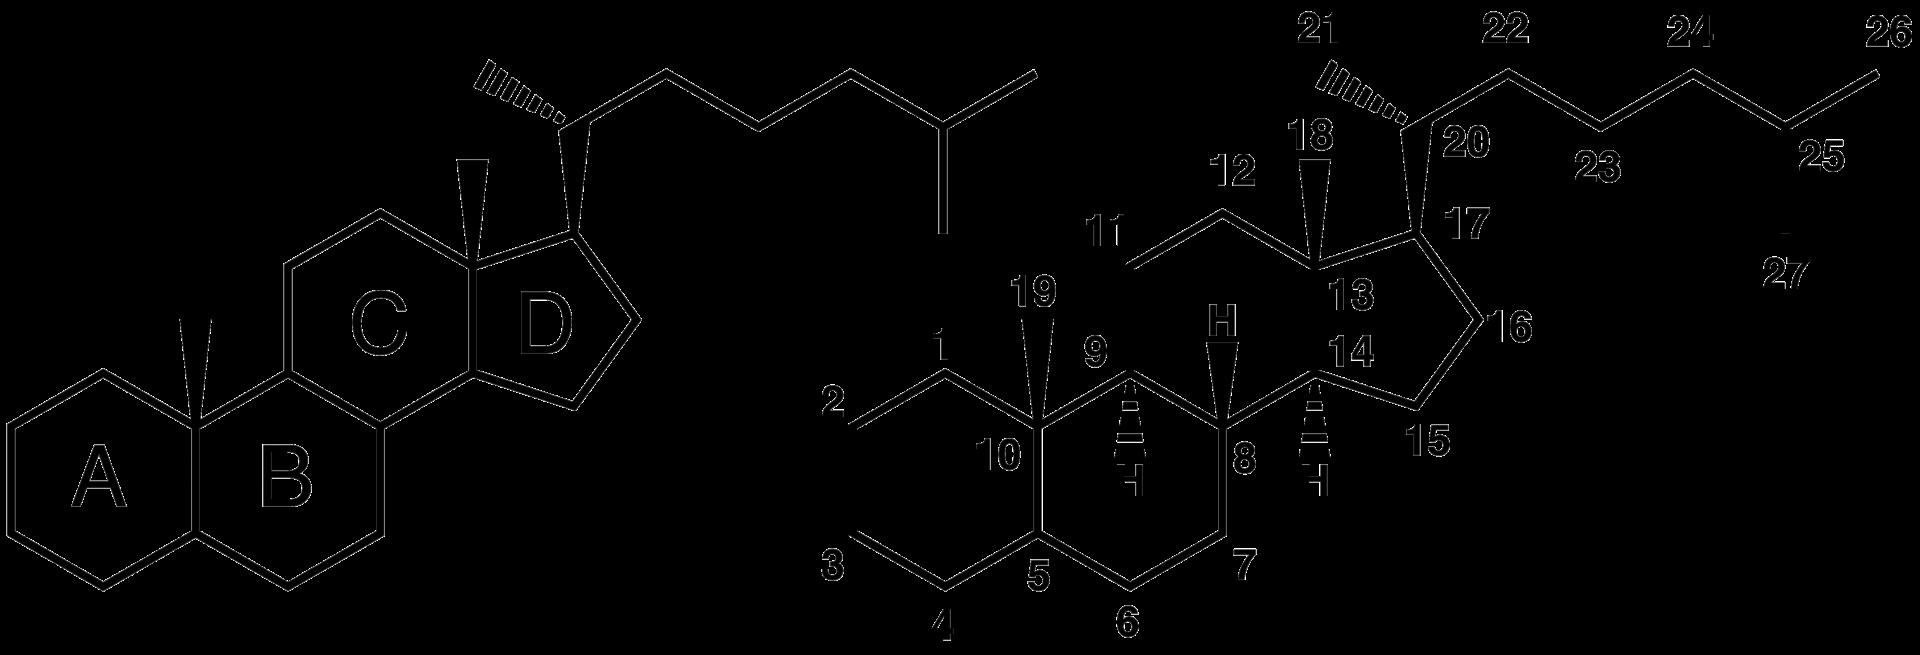 fluorinated steroids pregnancy